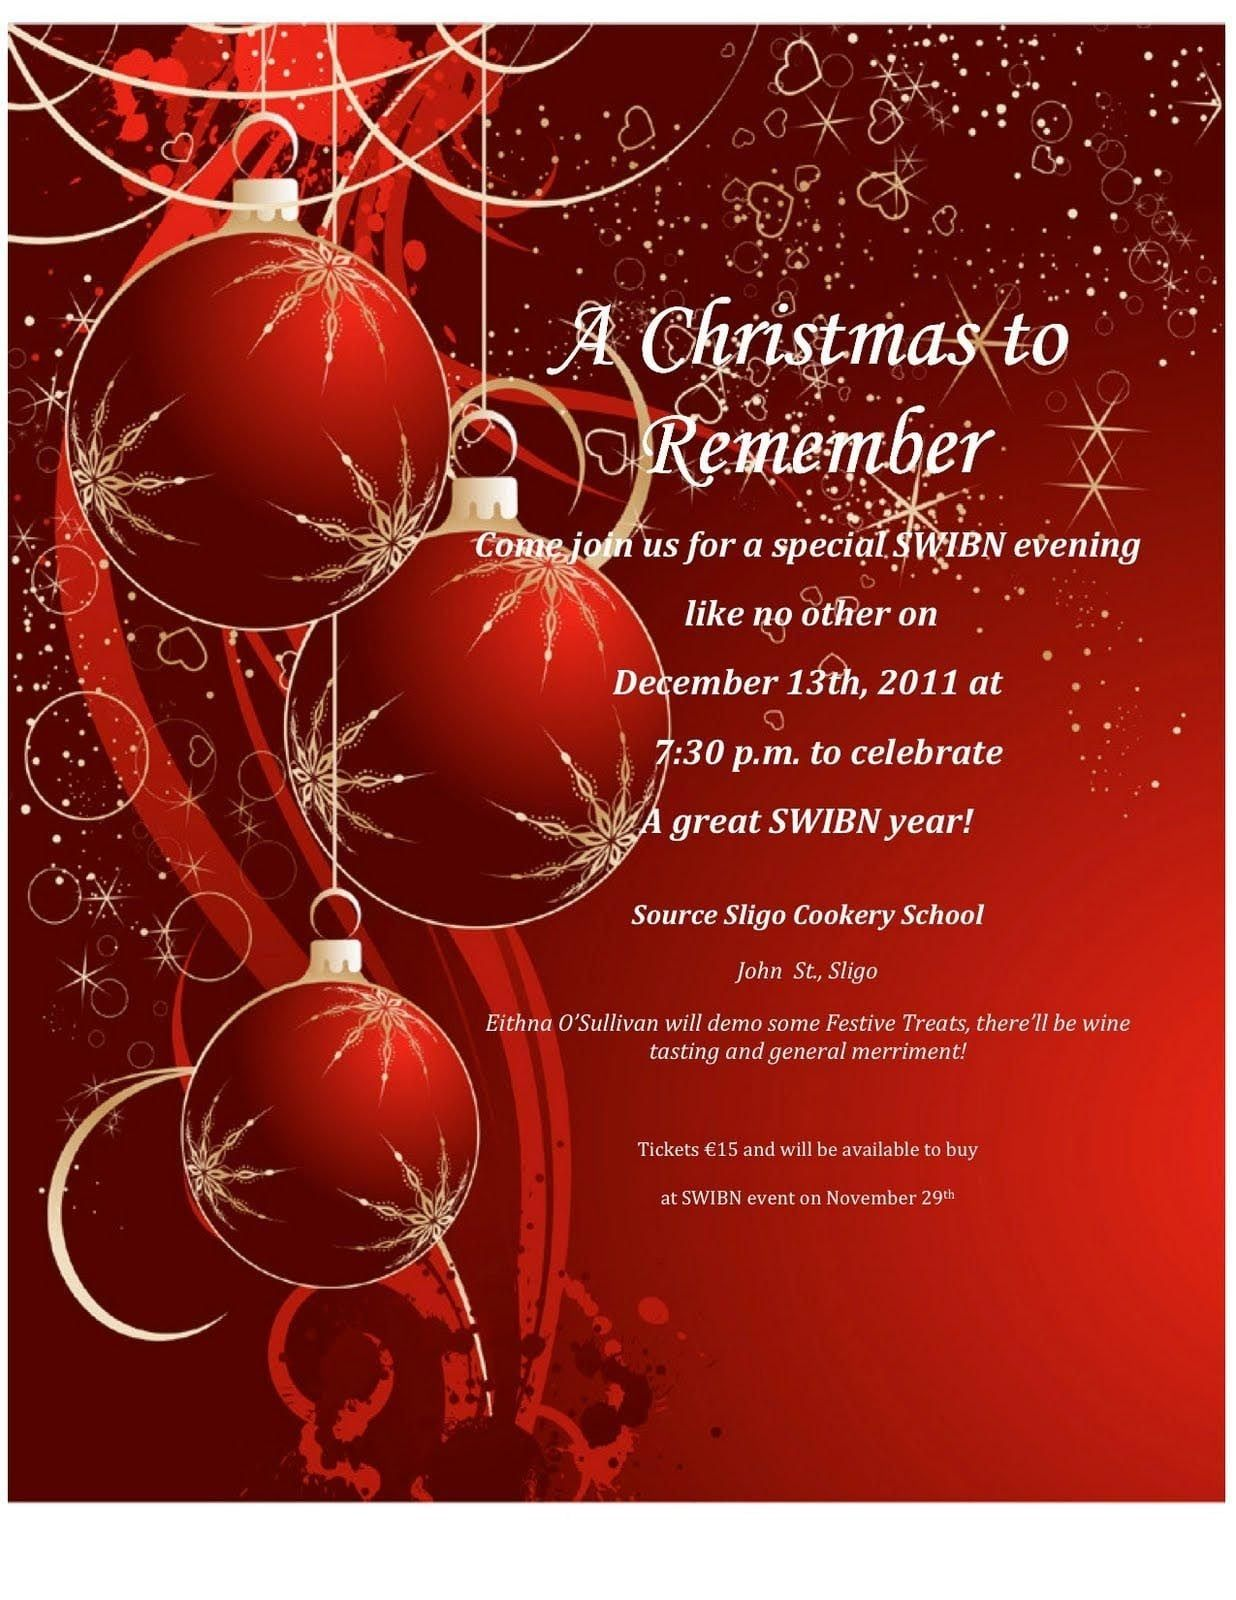 Holiday Party Invitation Templates Free Christmas Invitations Template Christmas Party Invitation Template Free Christmas Invitation Templates